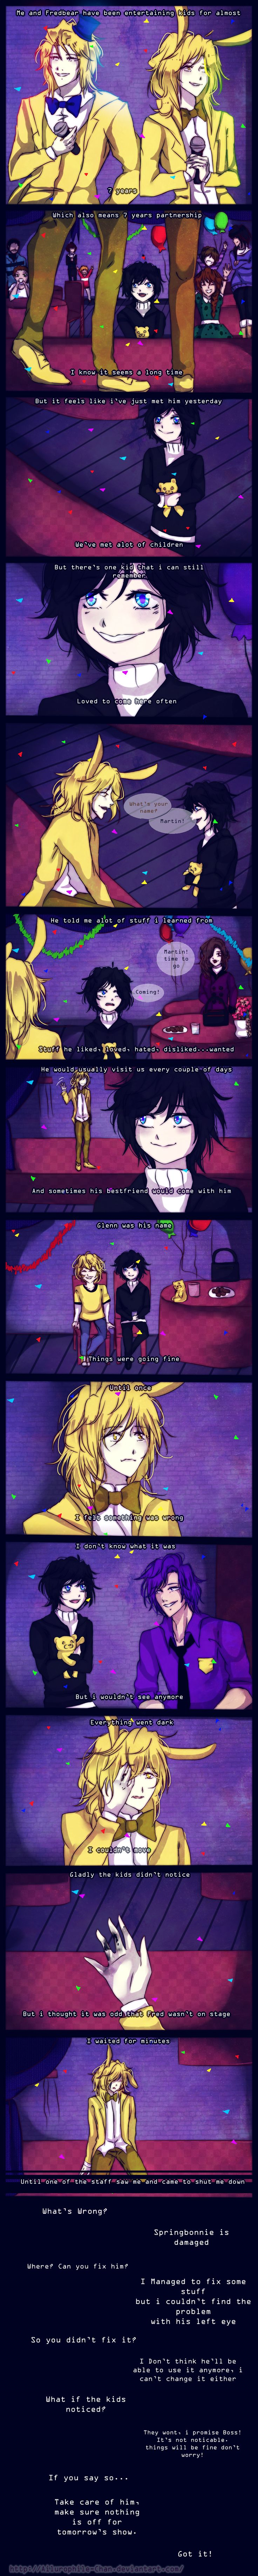 .:Lost [FNaF AU Comic] Page 2 :. by Ailurophile-Chan